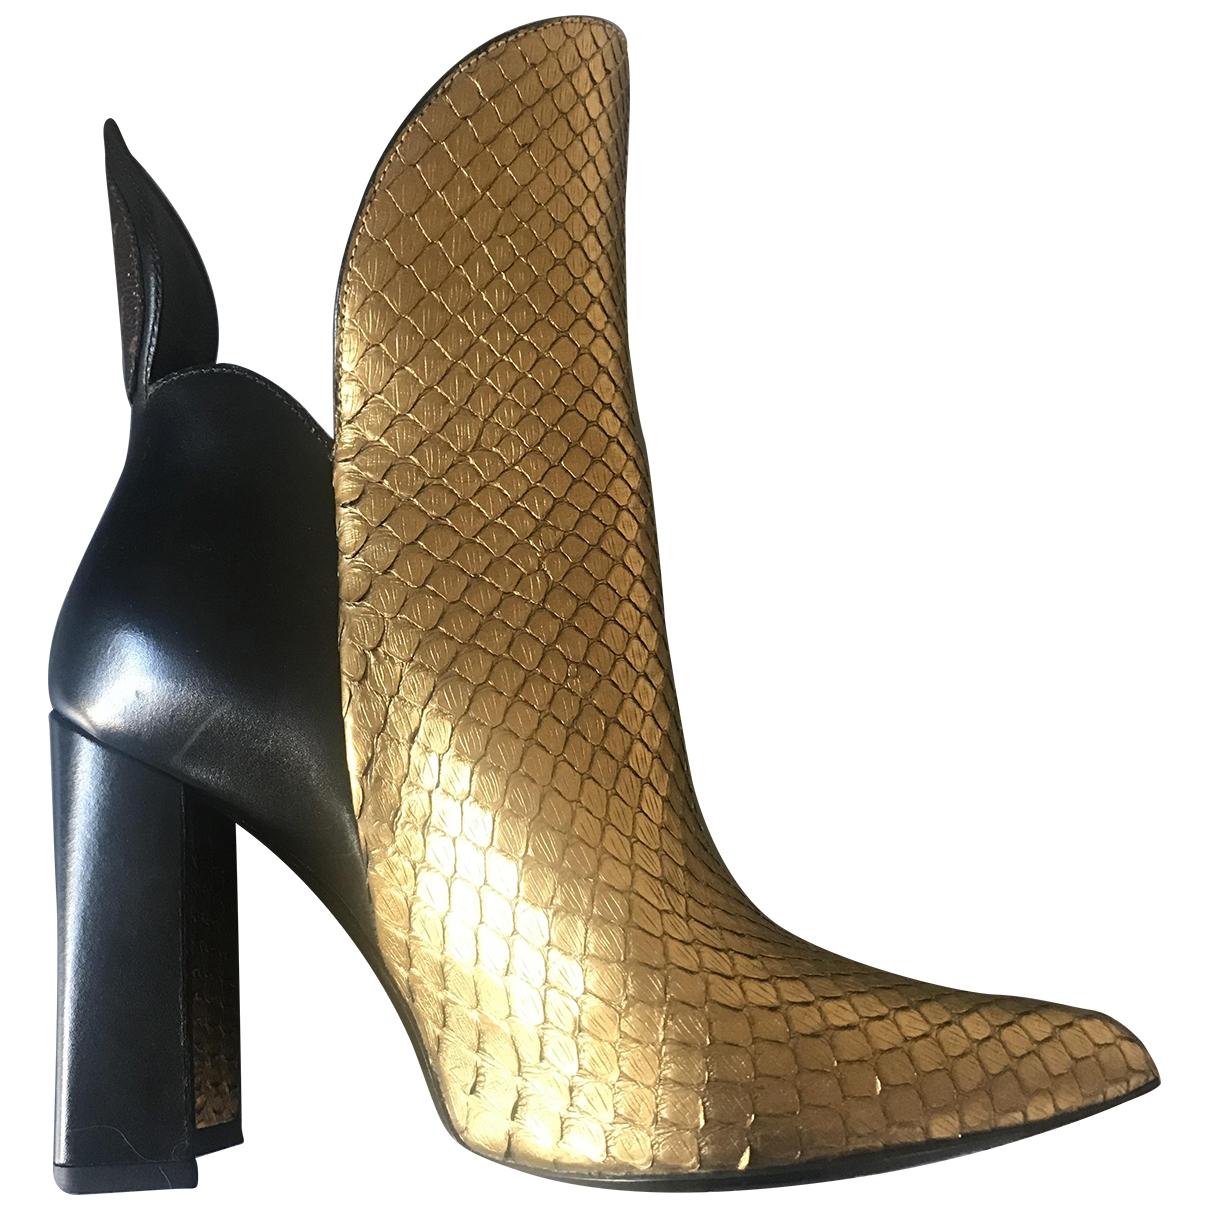 Botines Matchmake de Piton Louis Vuitton